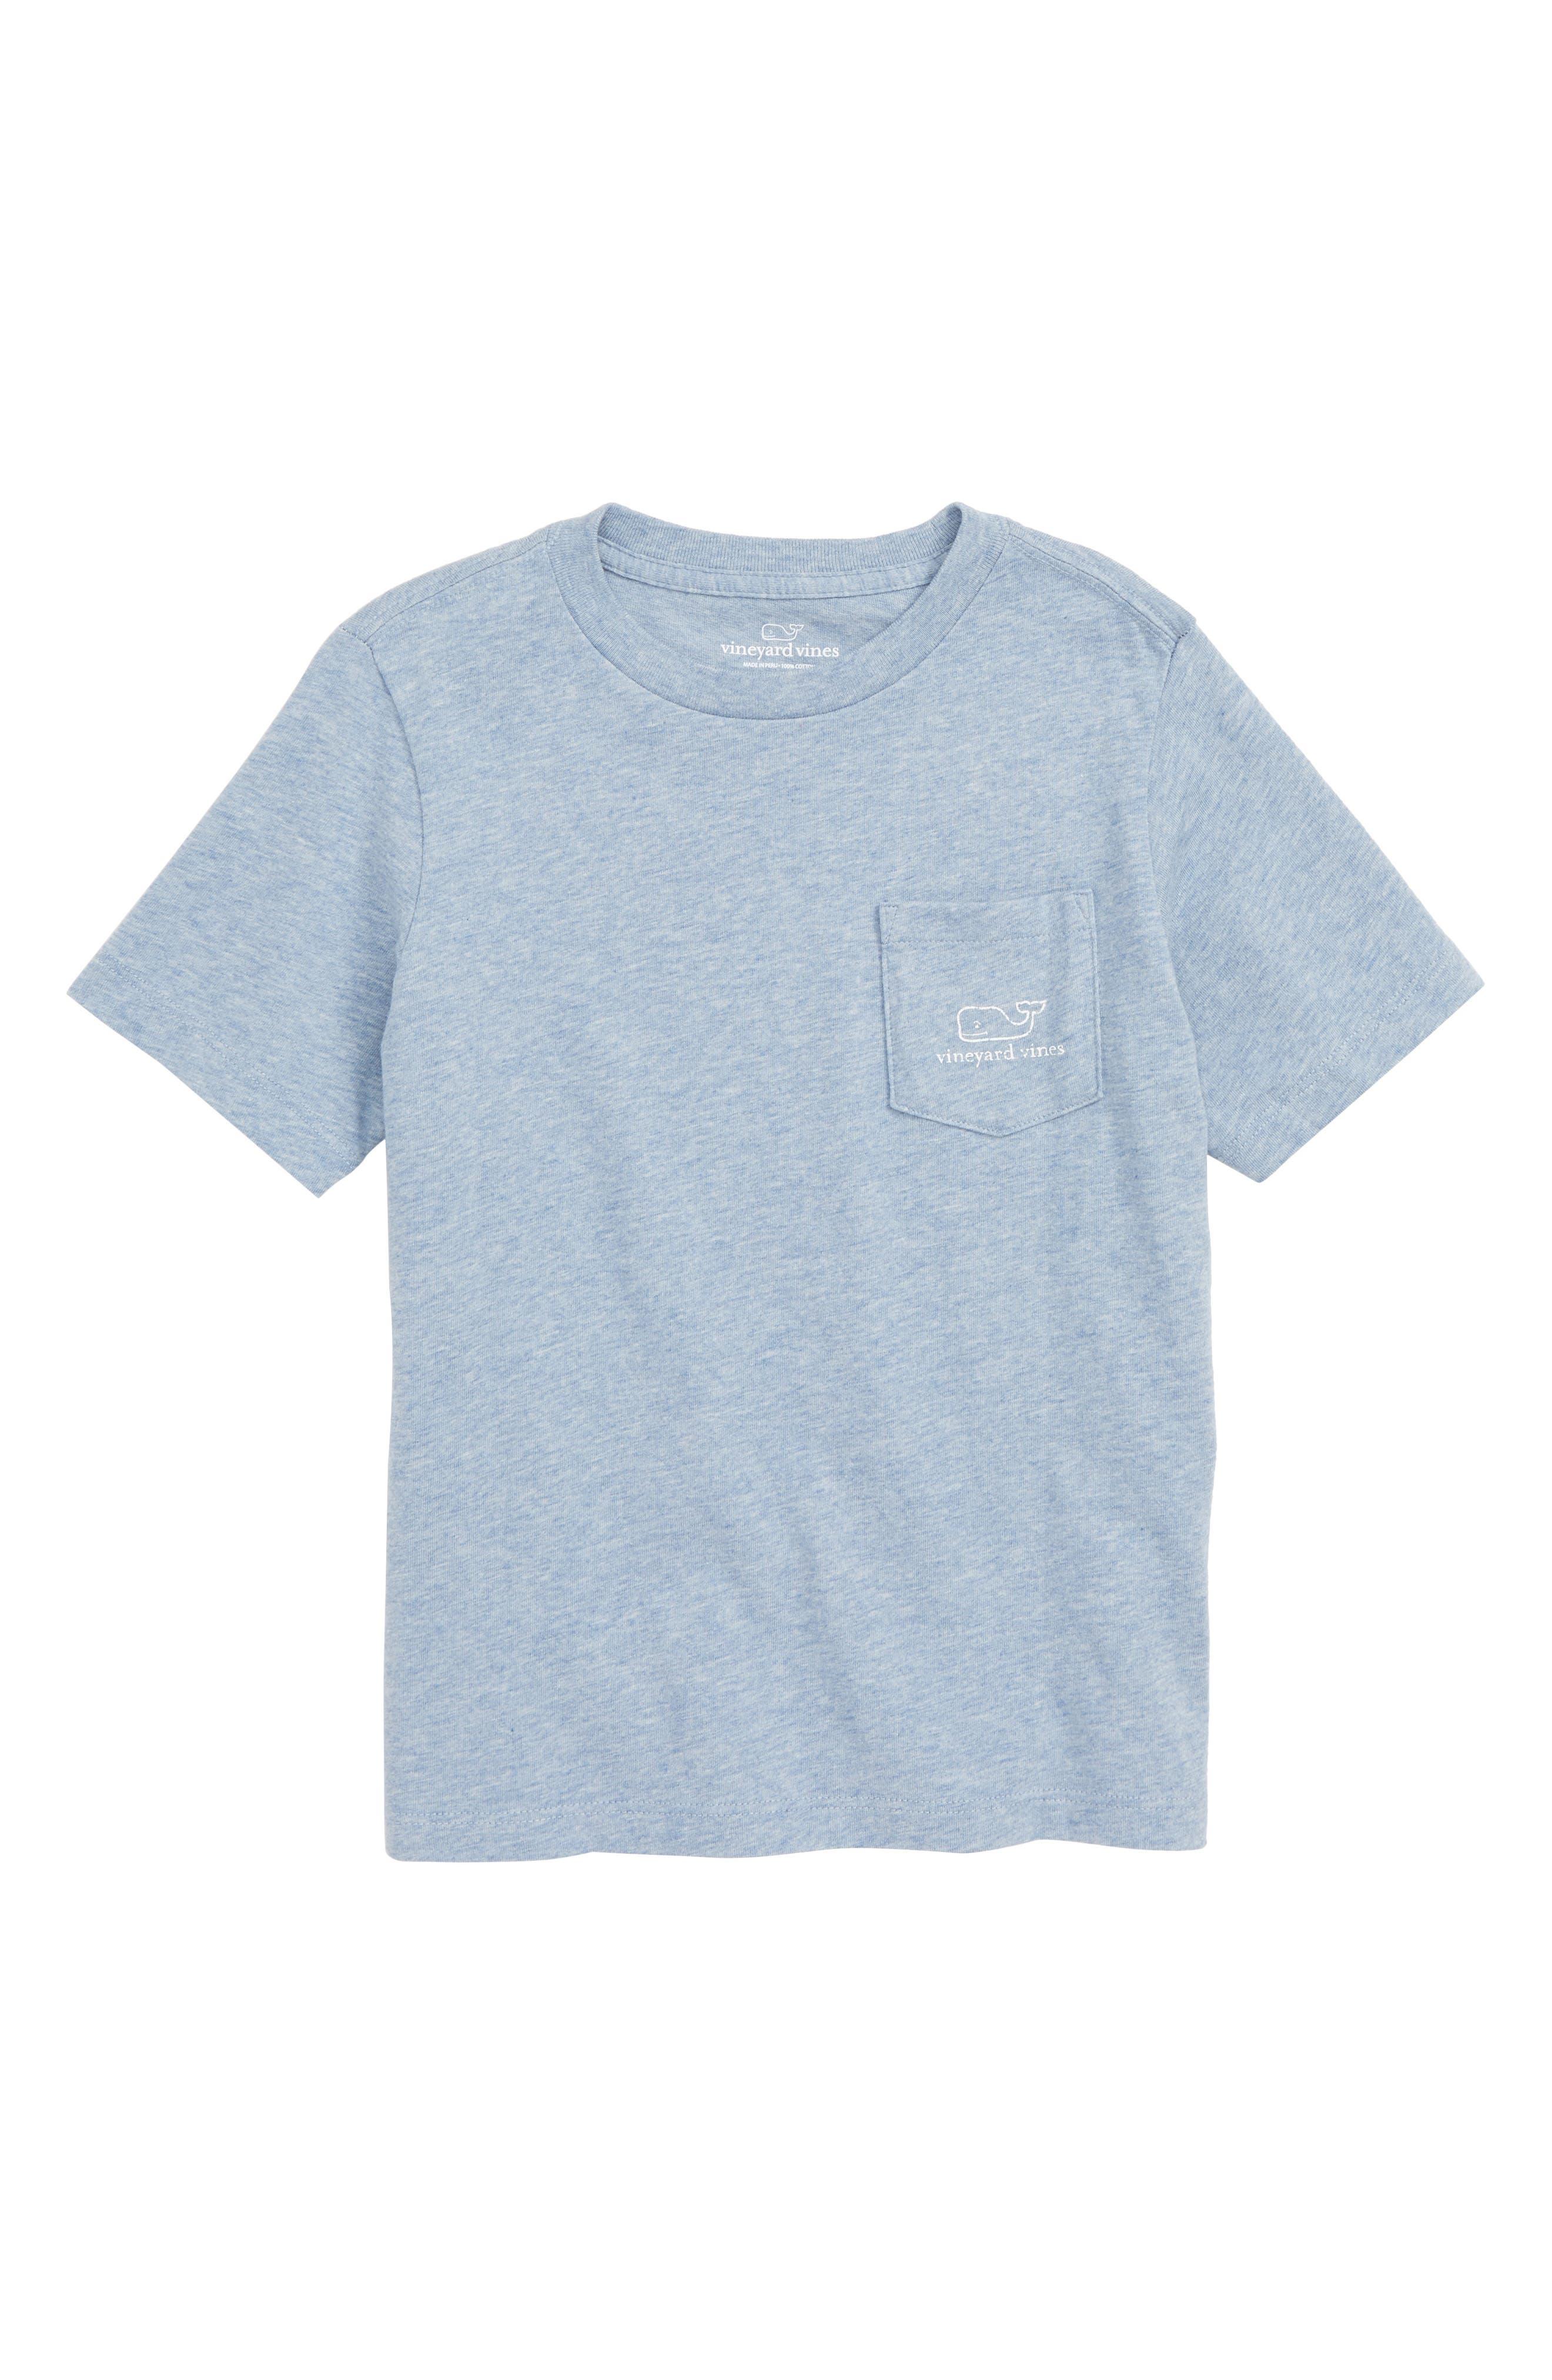 Heathered Vintage Whale Pocket T-Shirt,                             Main thumbnail 1, color,                             COASTLINE